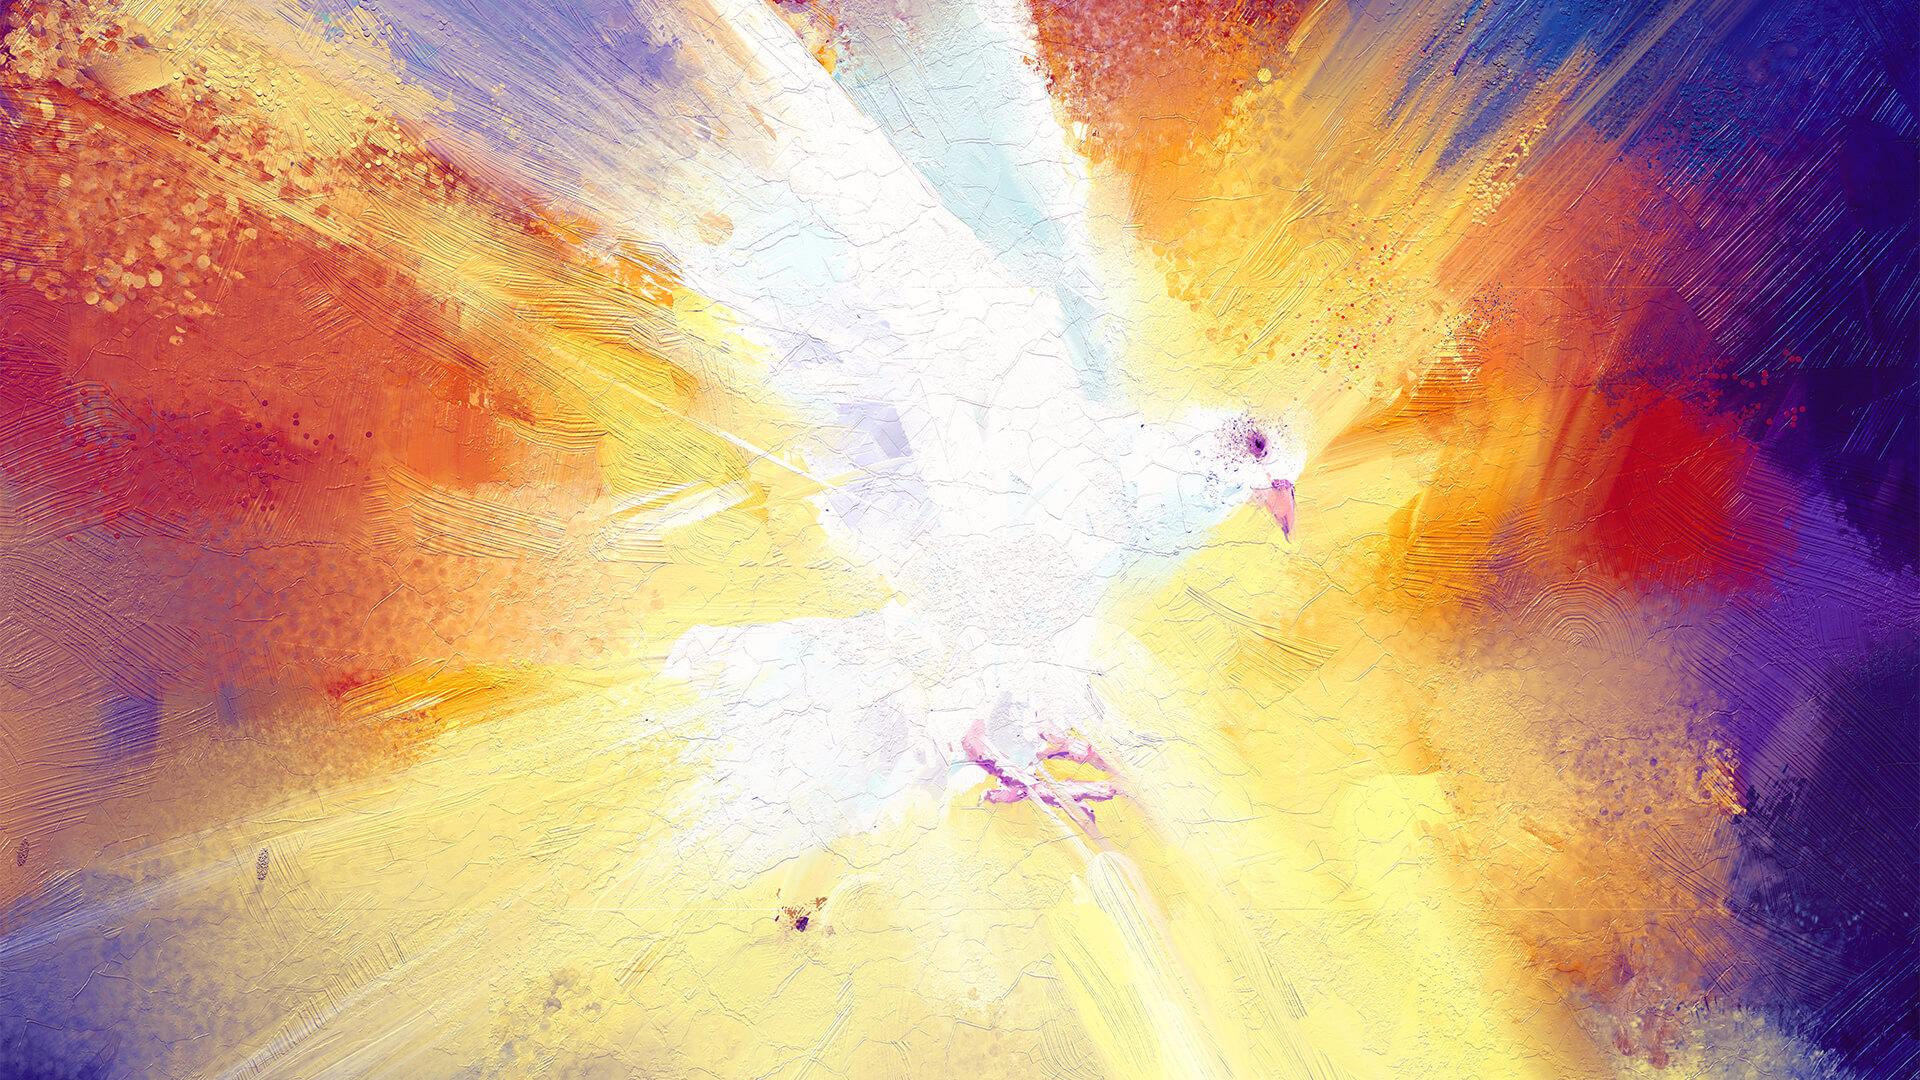 Digging Deeper into Scripture: Ezekiel 37